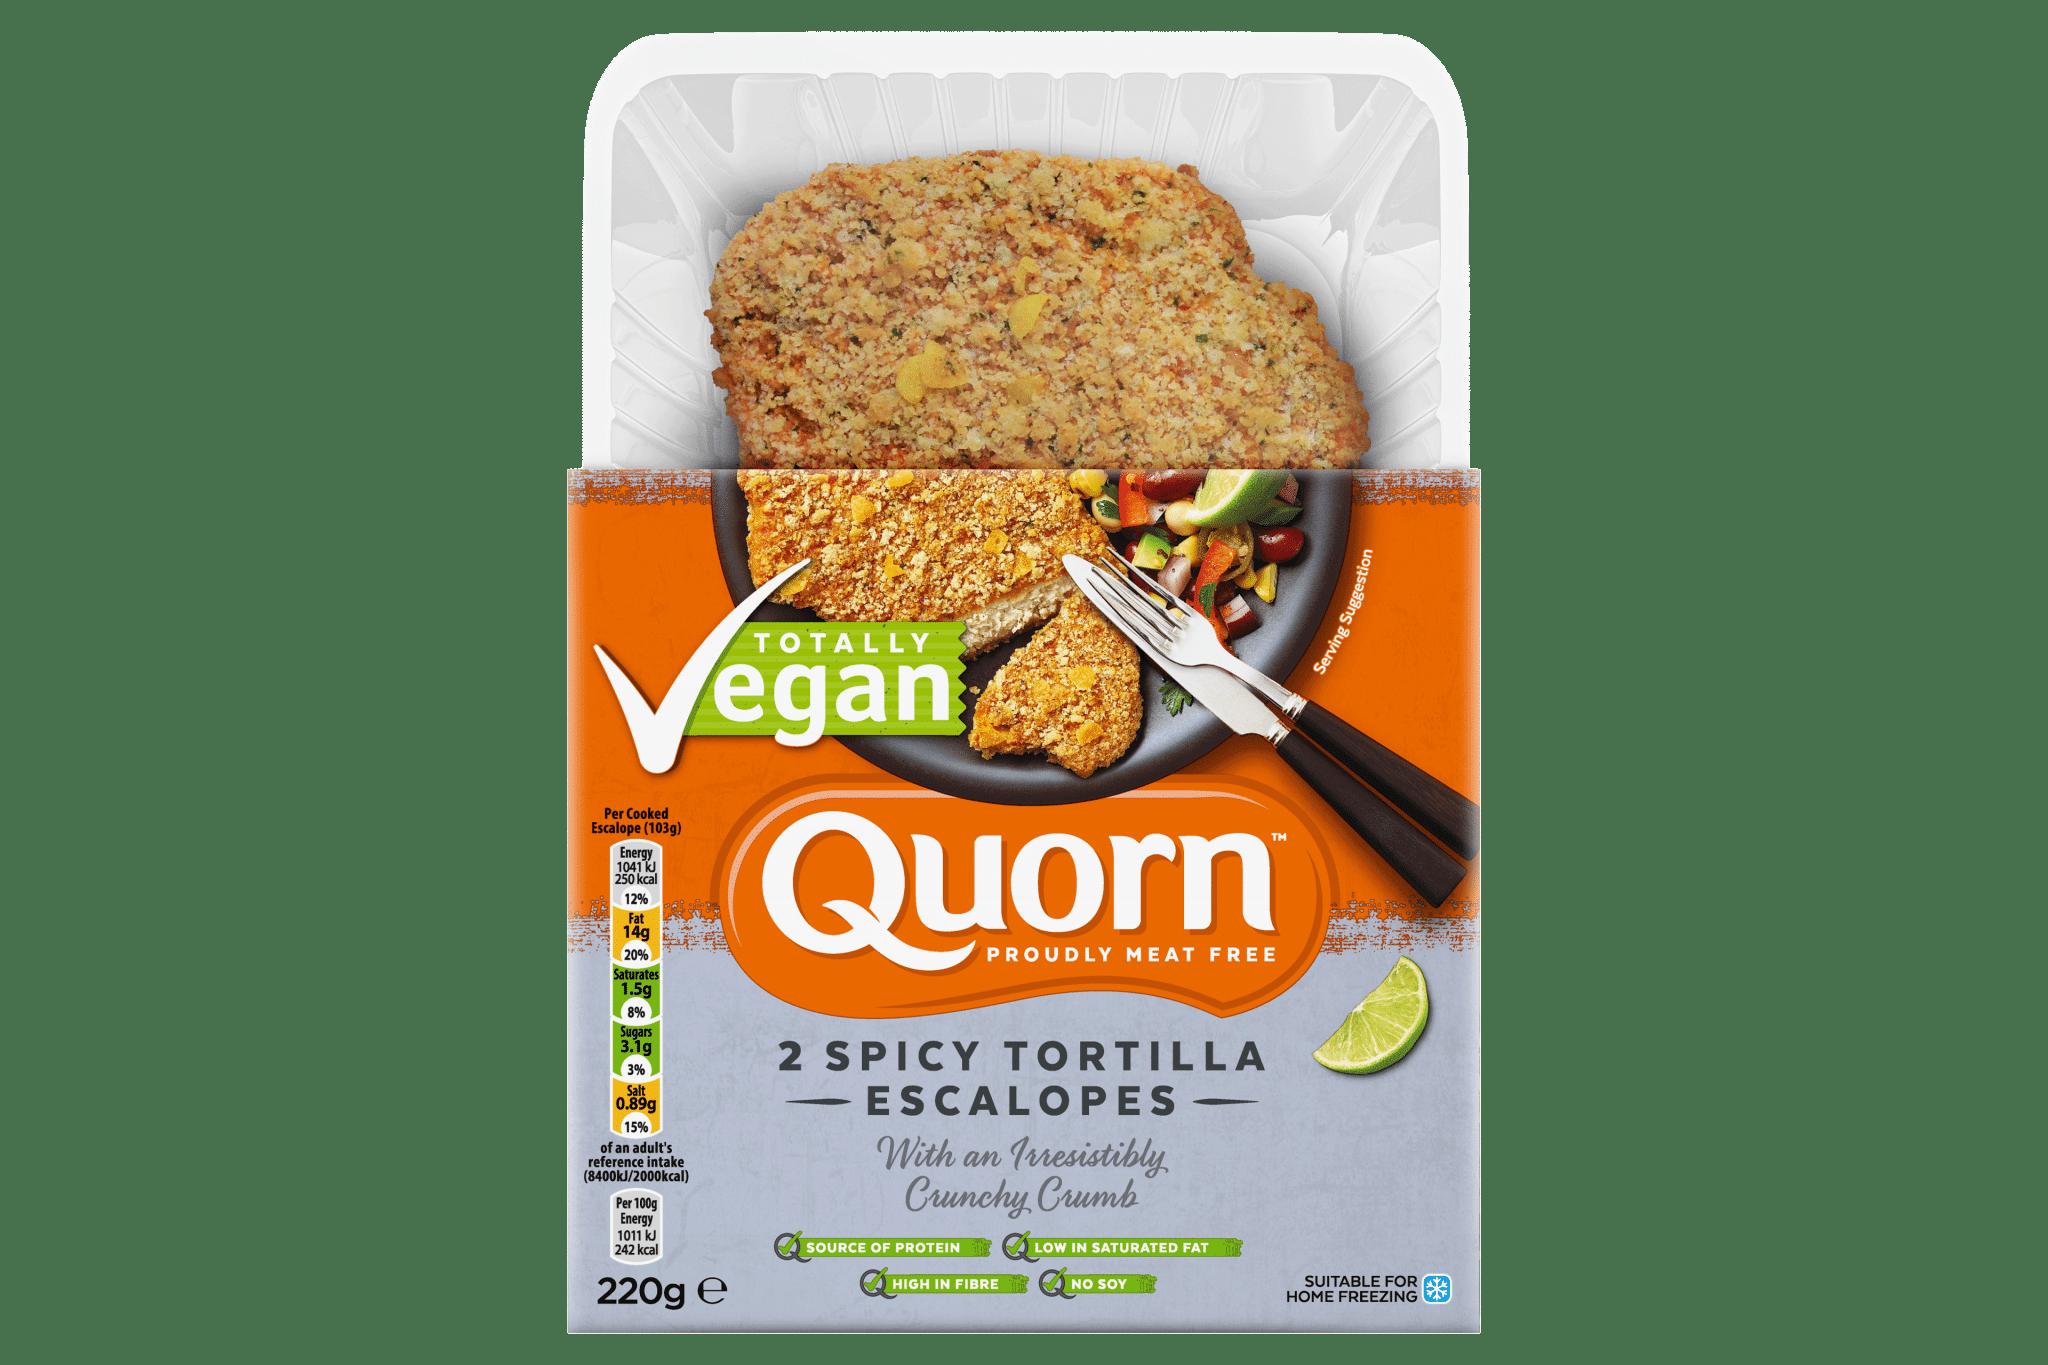 Quorn spicy escalopes